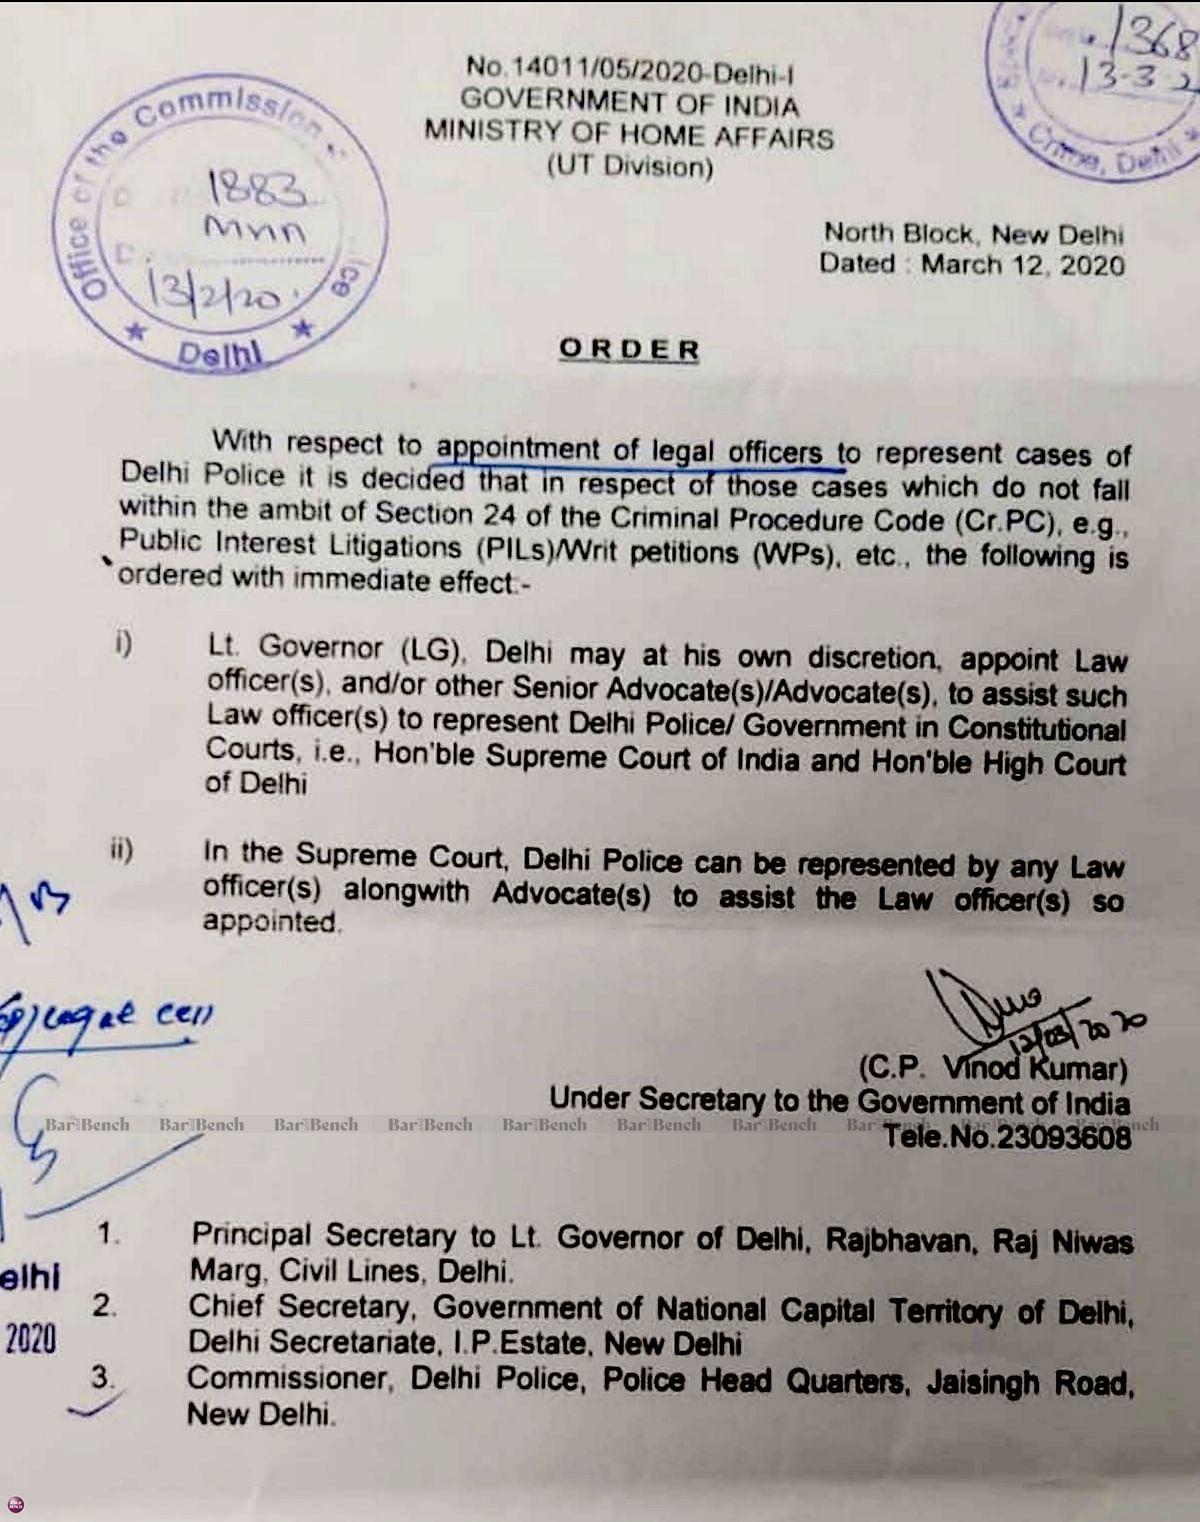 Home Ministry Order on Delhi Police